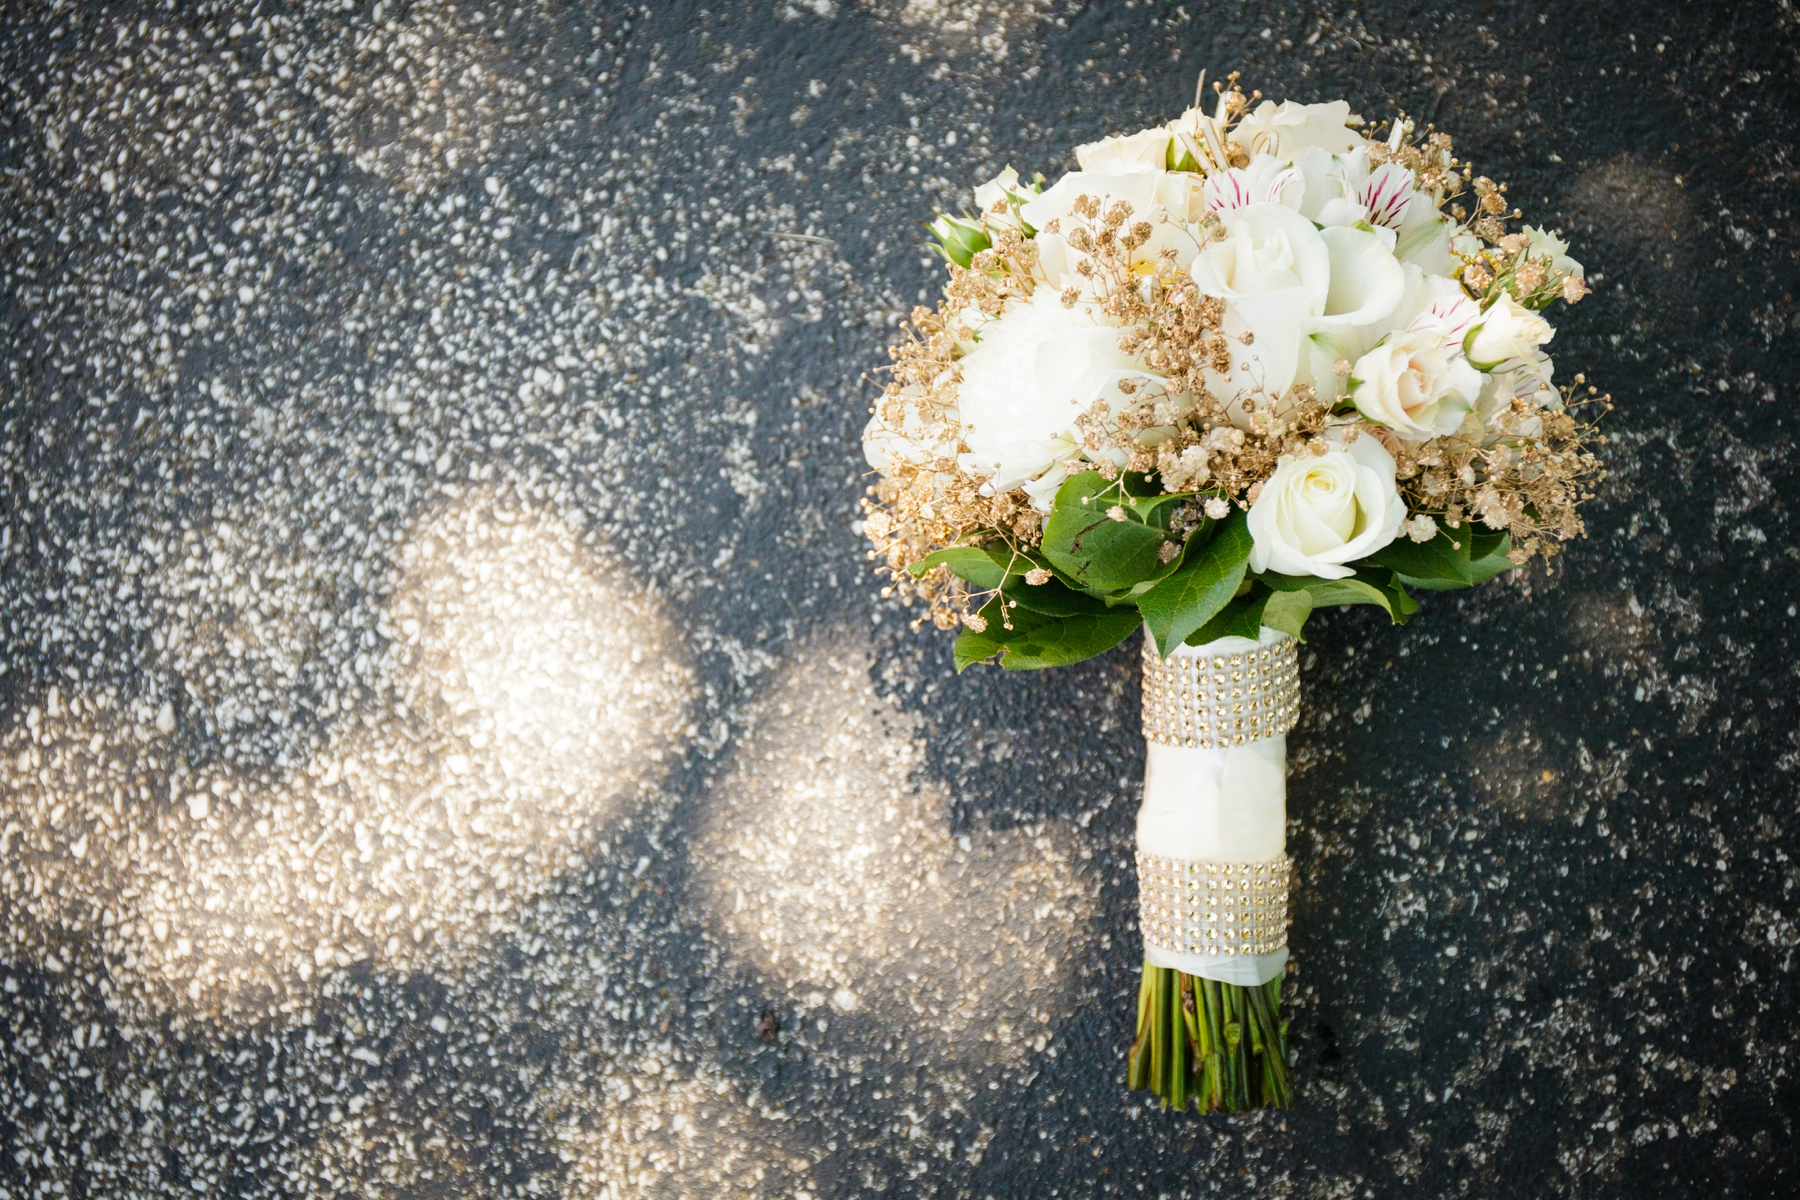 Ben_Jillian_Midland_Baycity_Wedding_0015.jpg